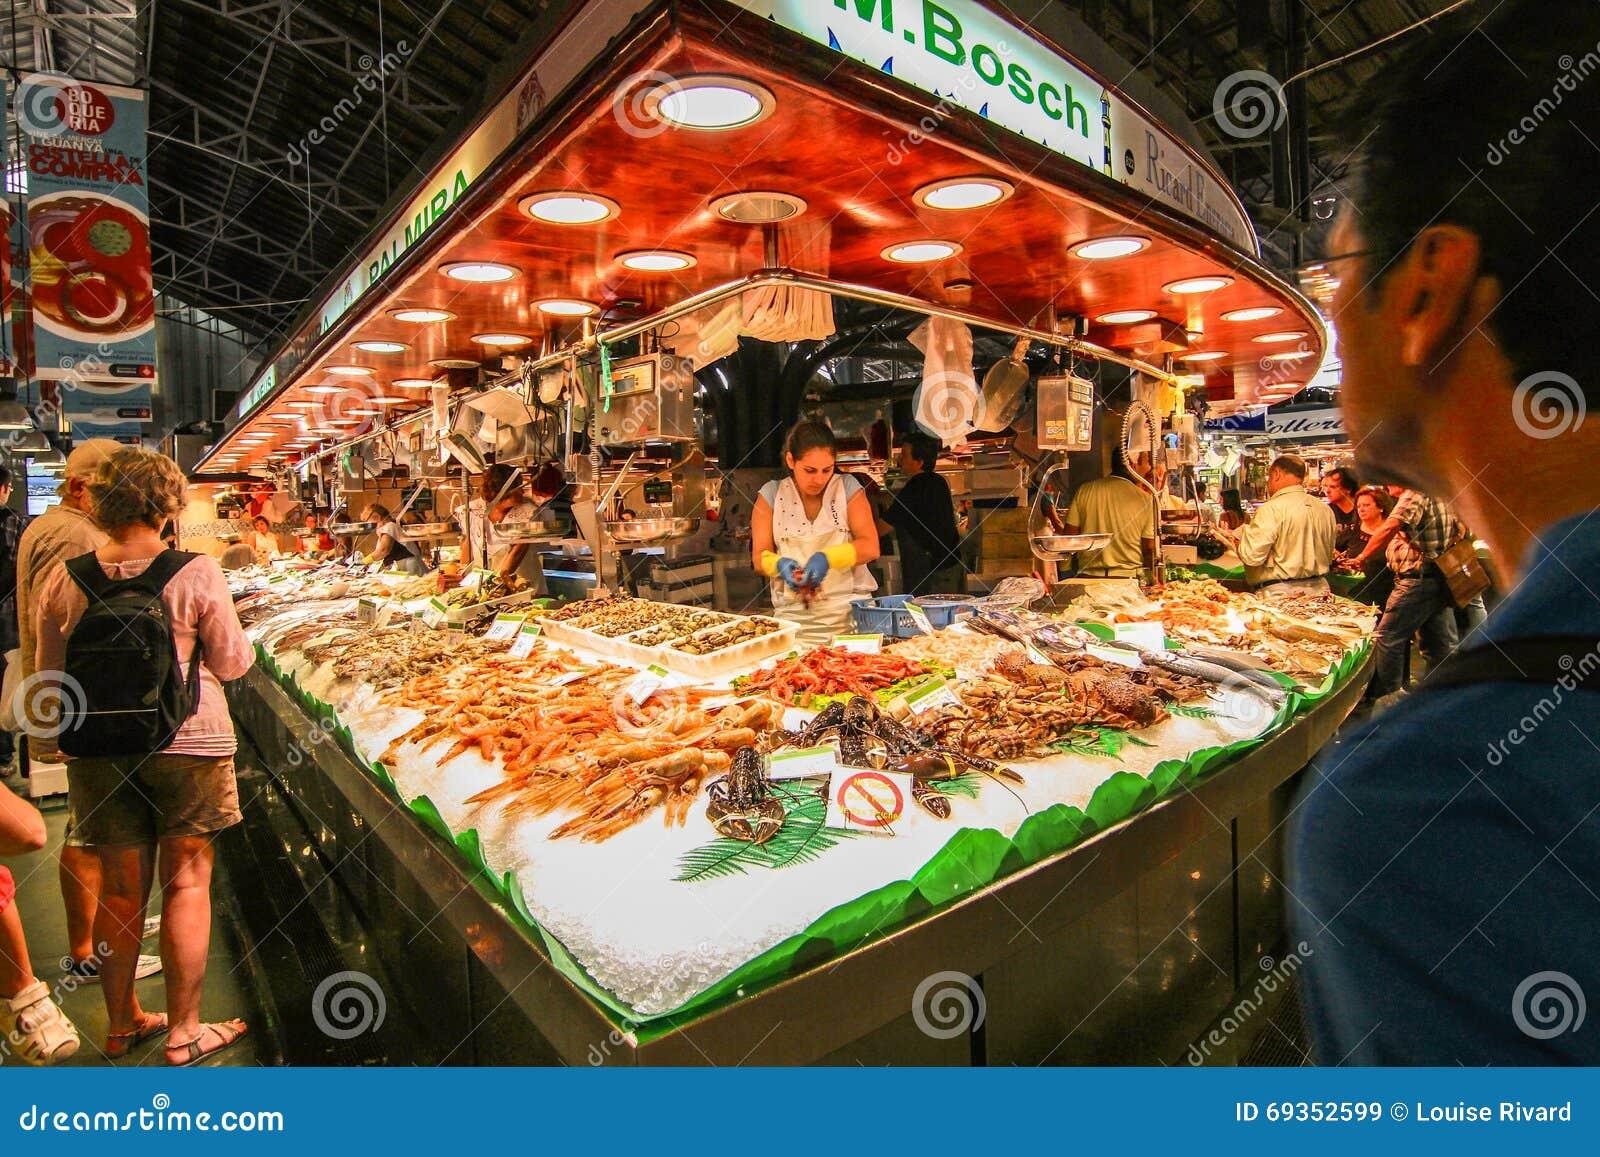 Boqueria market products